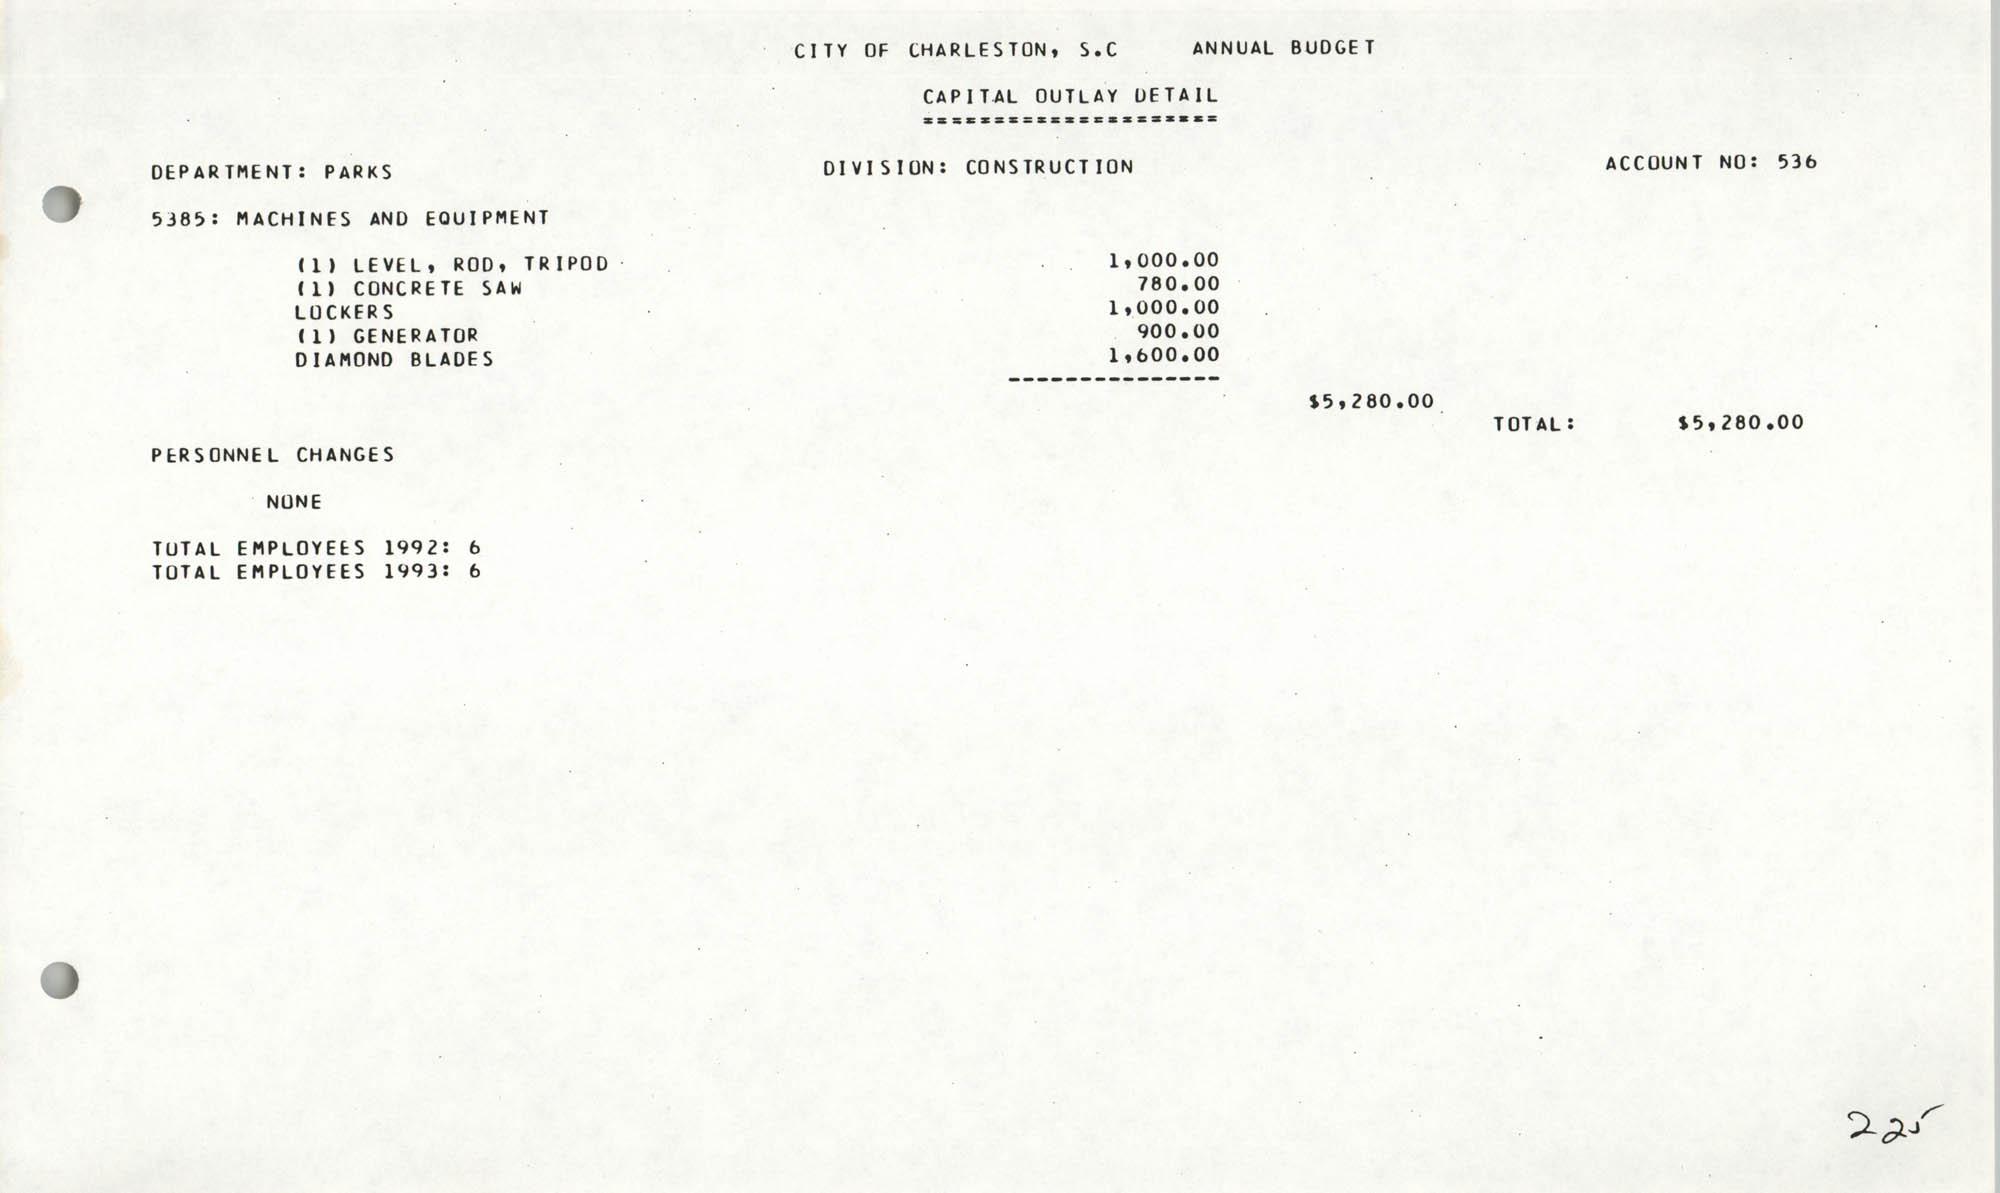 The City Council of Charleston, South Carolina, 1993 Budget, Page 225